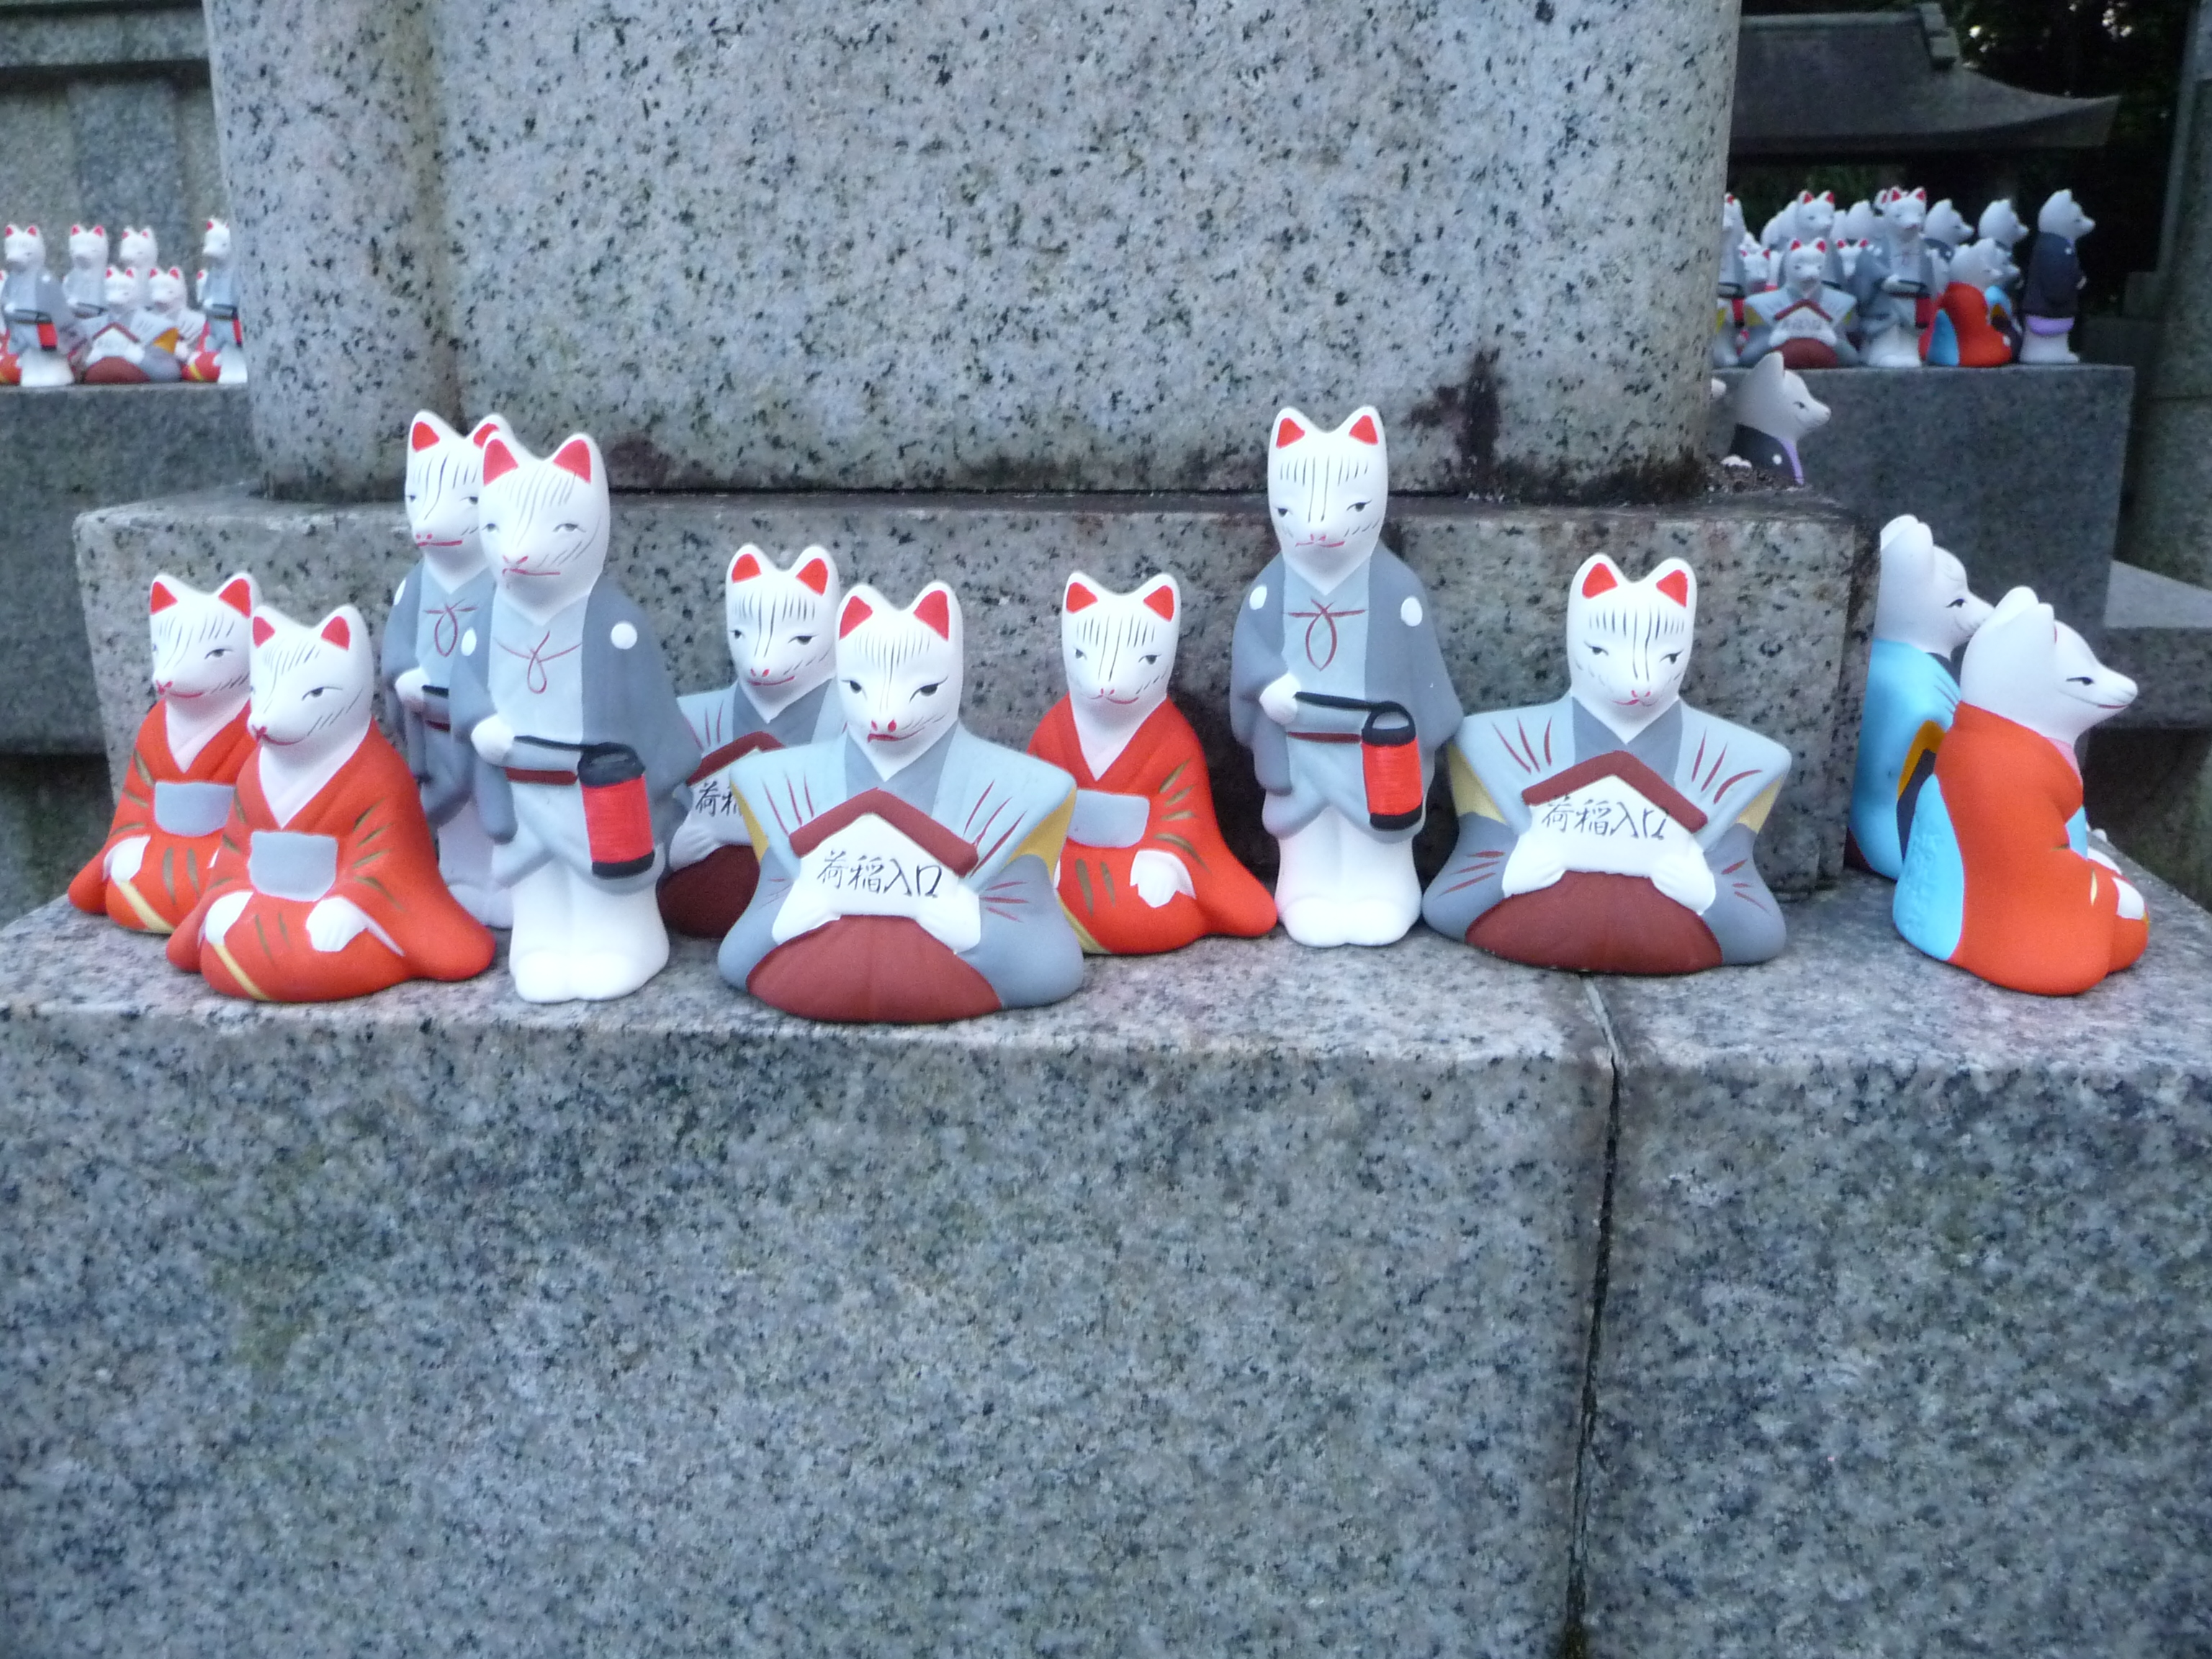 Several statues of white foxes in kimono